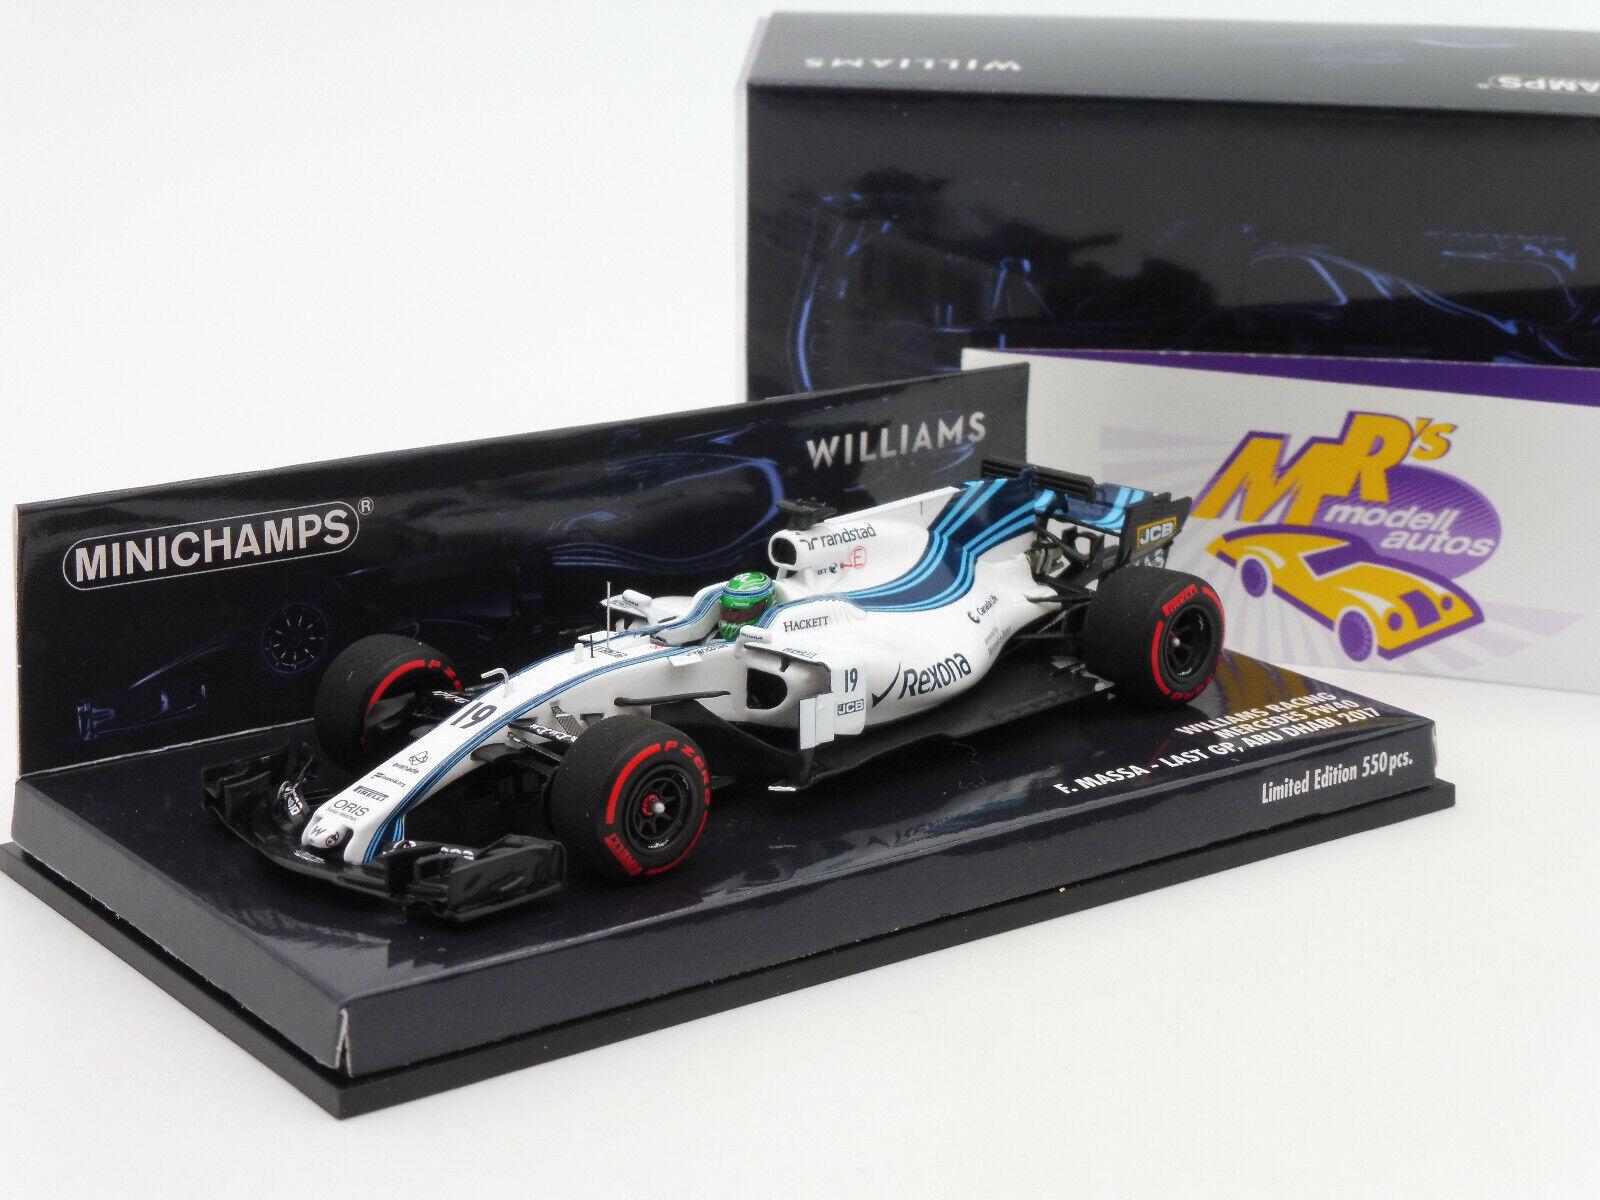 Minichamps 417172019   Williams Racing mercedes fw40  massa-Abu Dhabi  1 43